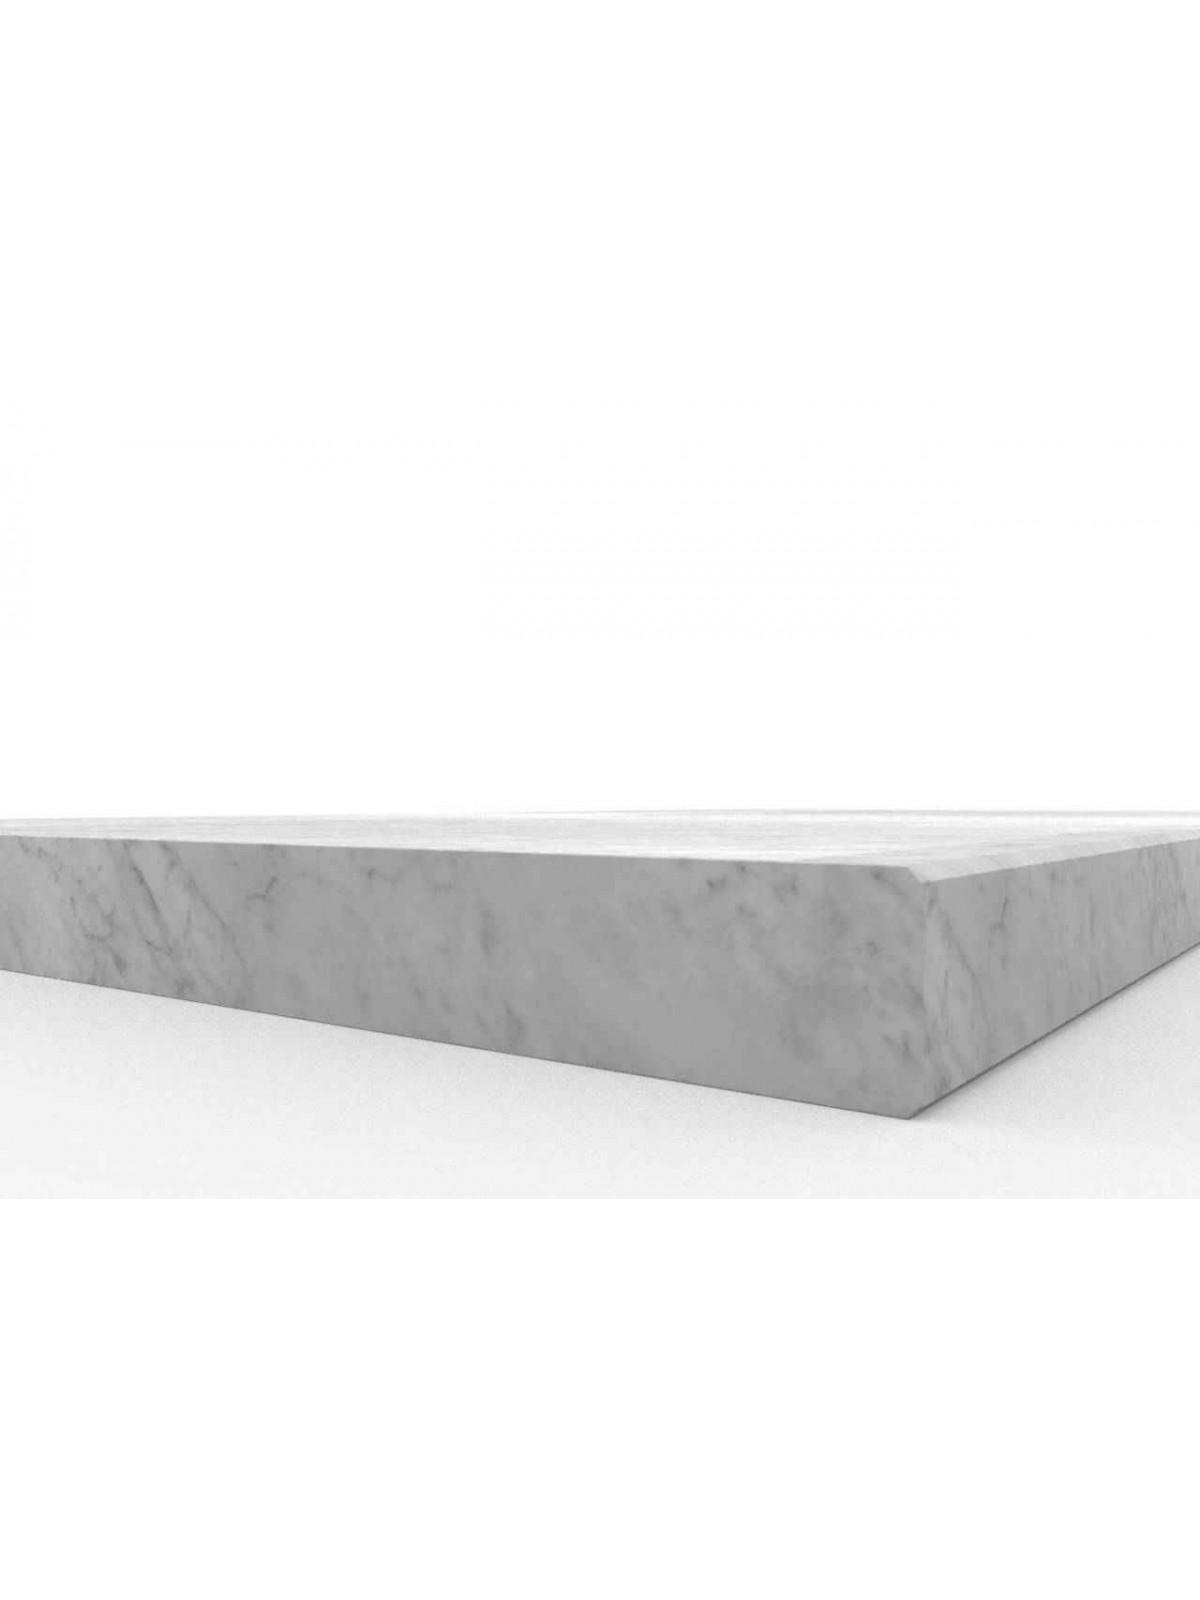 Carrara White Pedata